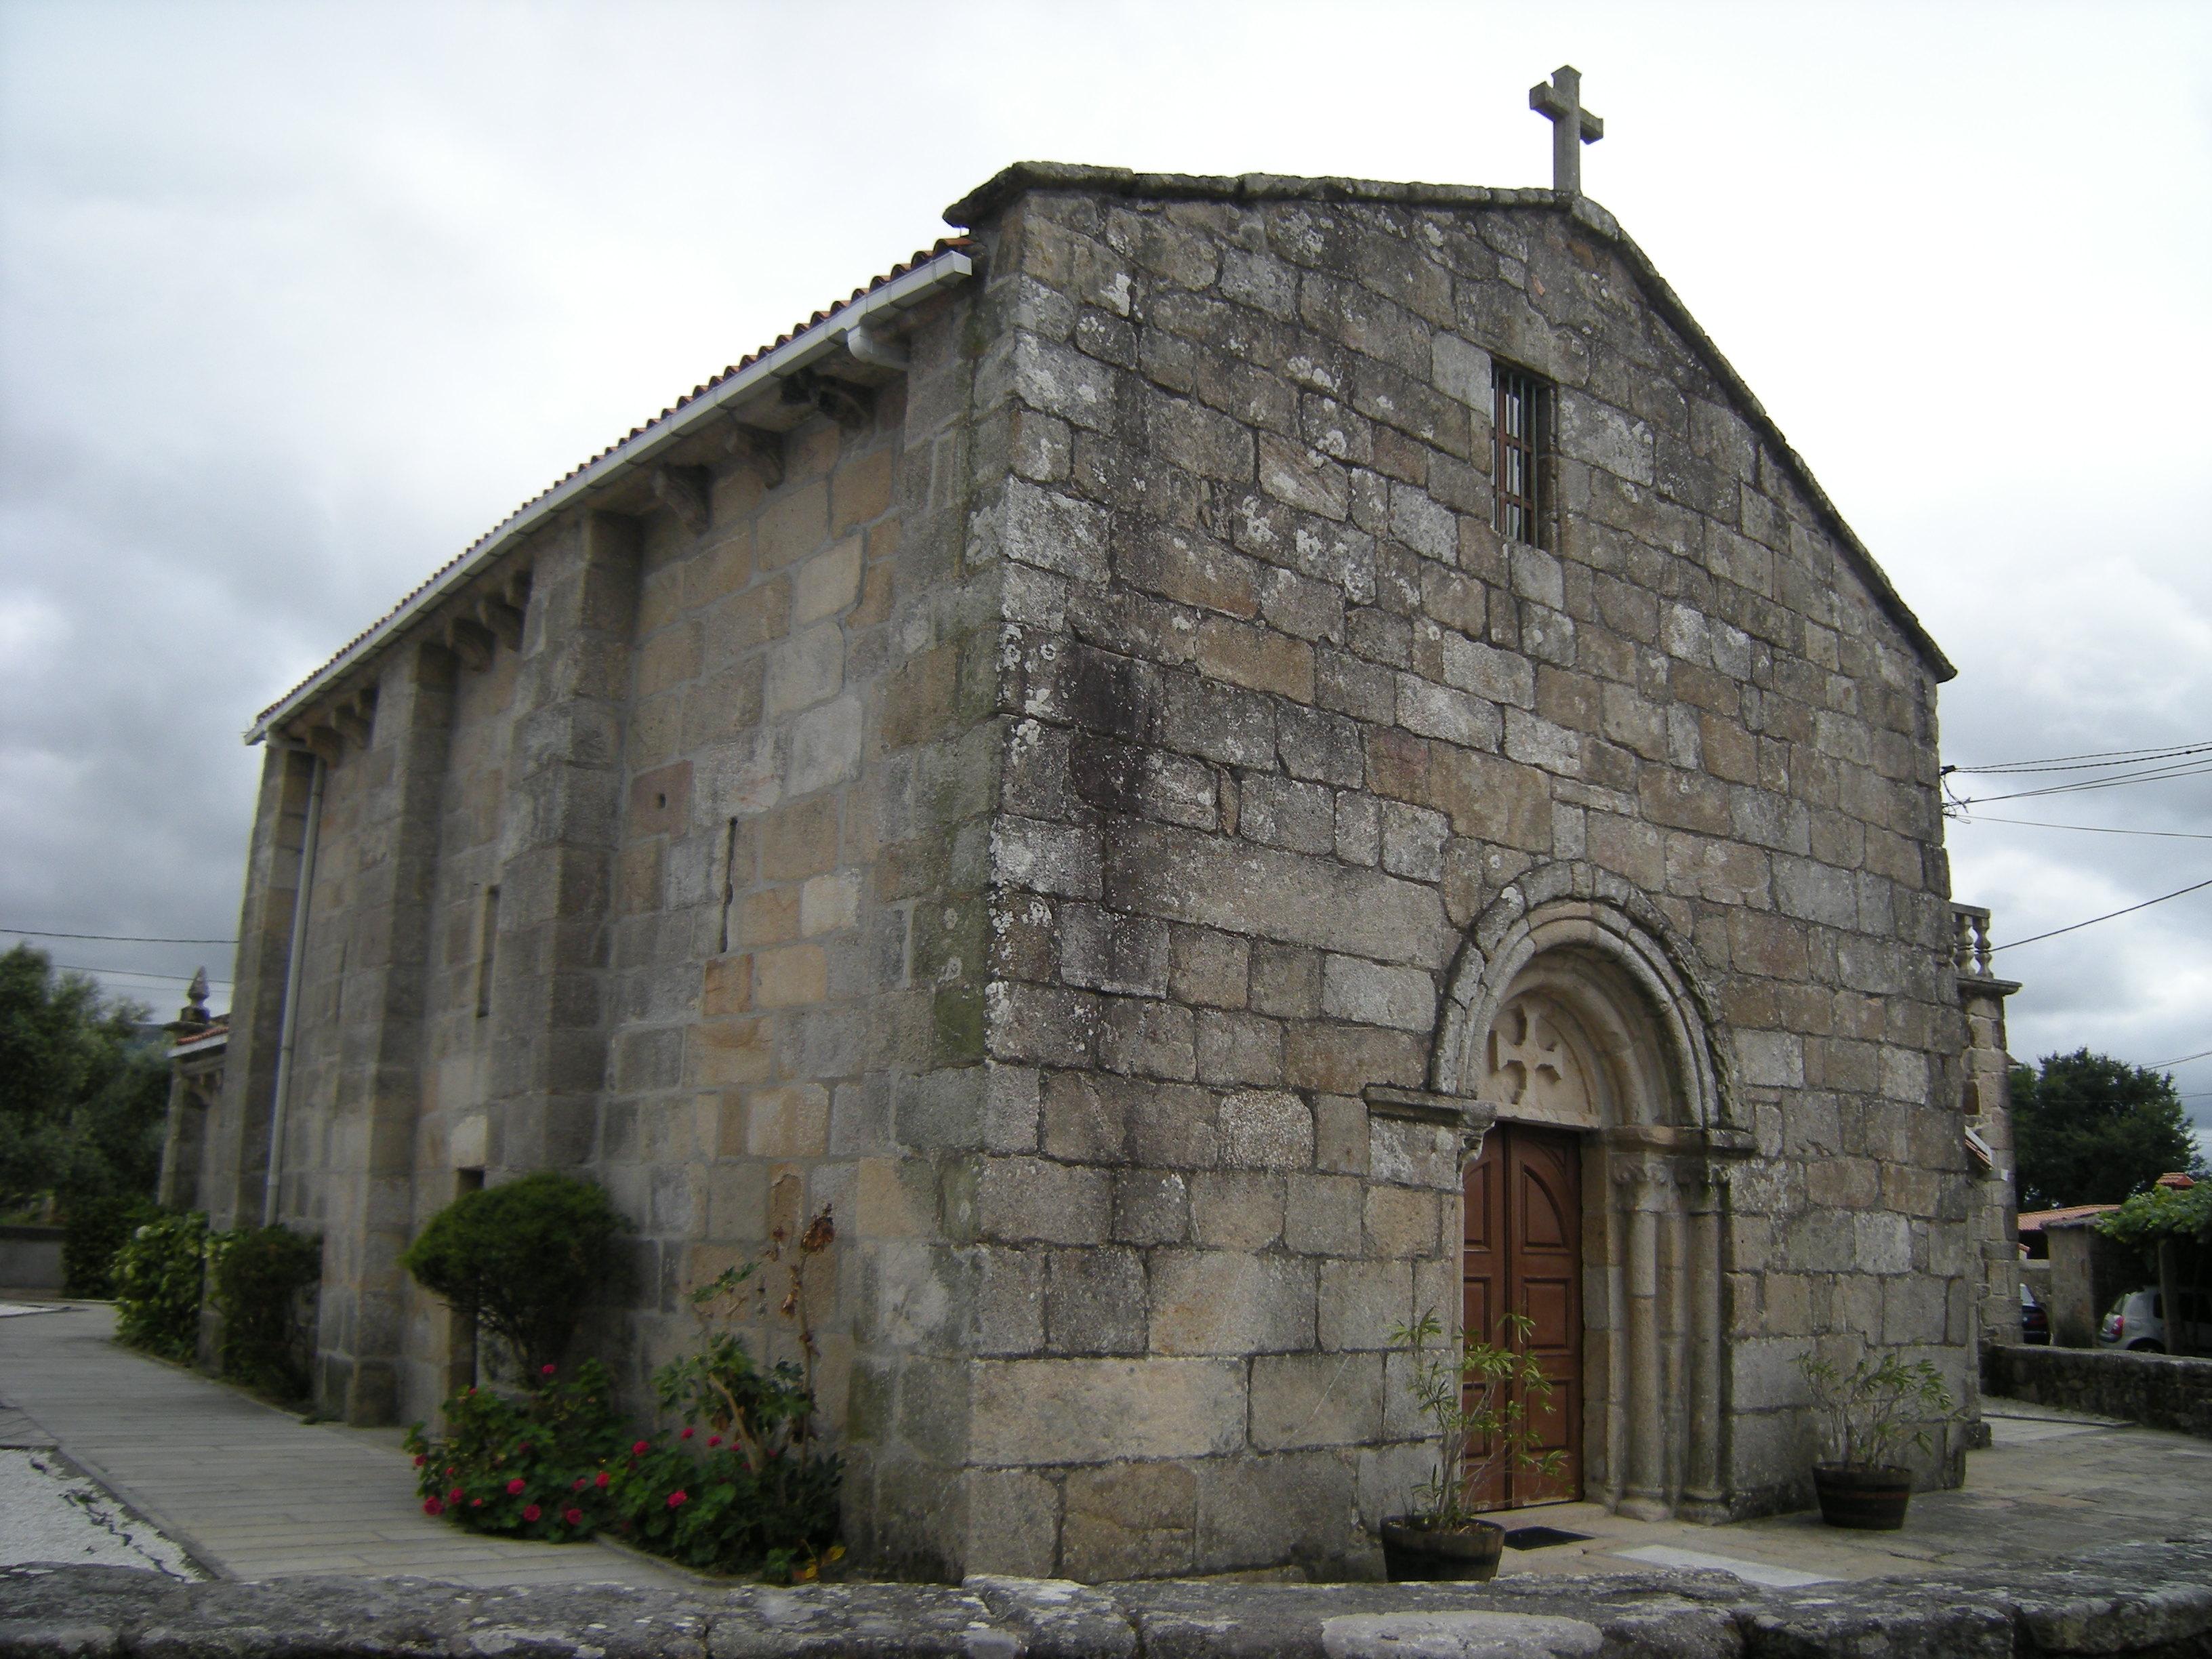 http://upload.wikimedia.org/wikipedia/commons/7/7c/Igrexa_de_Santa_Cristina_de_Campa%C3%B1a,_Valga.jpg